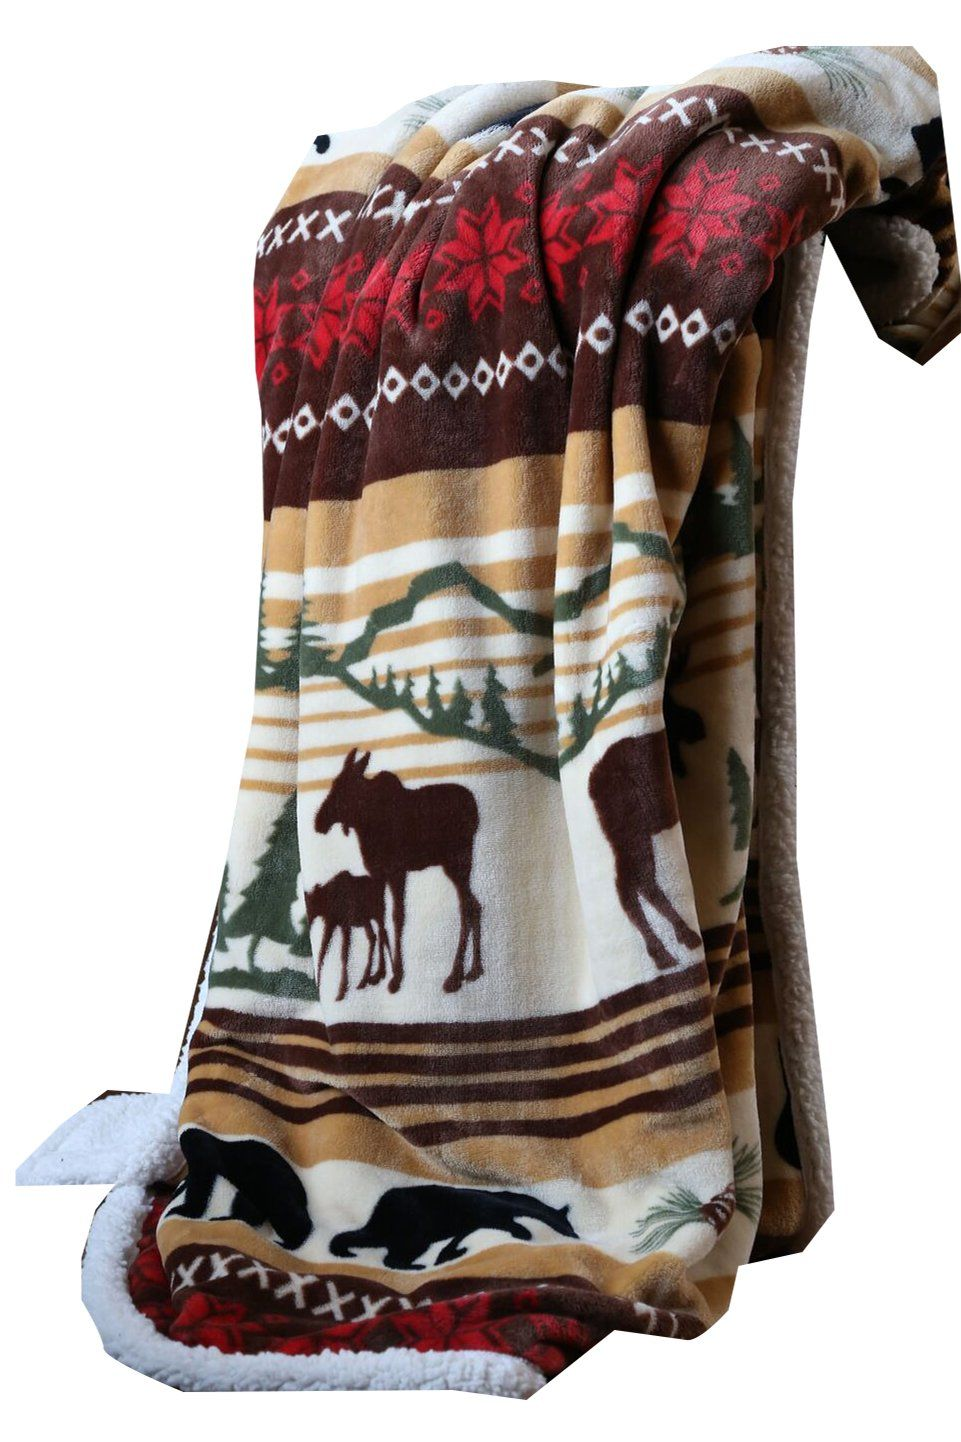 Hinterland Throw Plush Throw Blankets Rustic Blankets Plush Throw